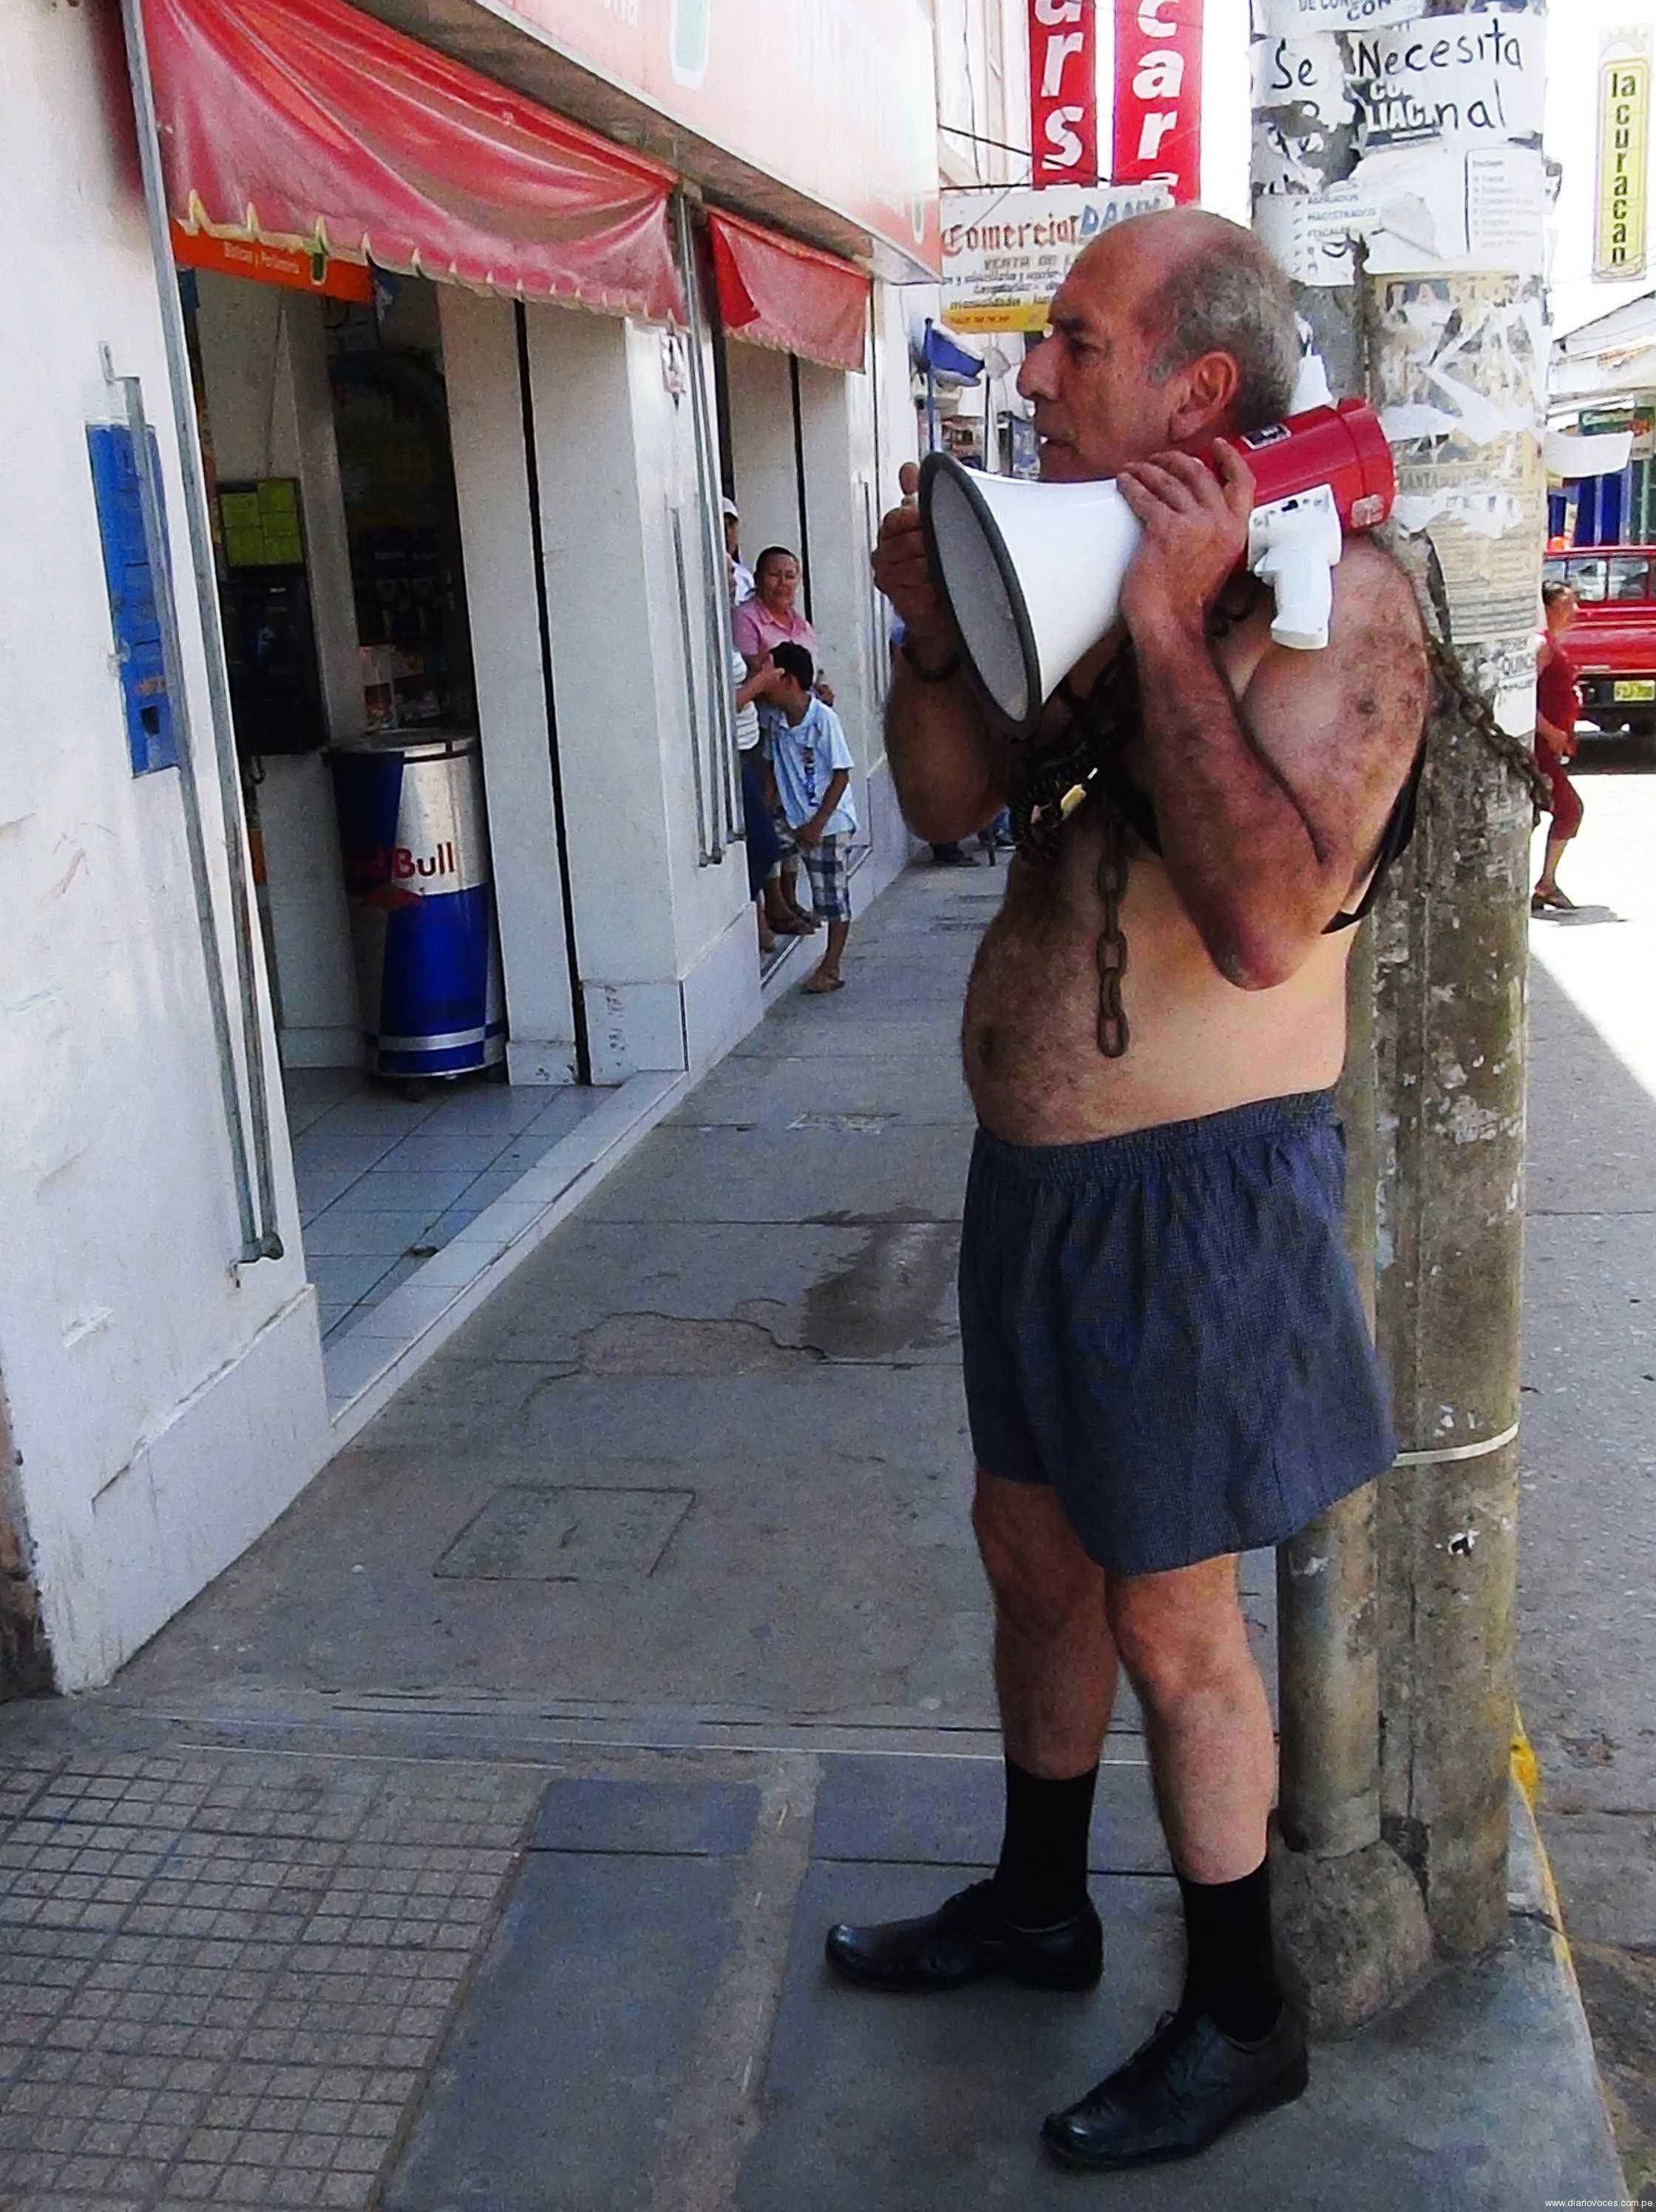 Padre de familia protesta semidesnudo en frontis del Poder Judicial